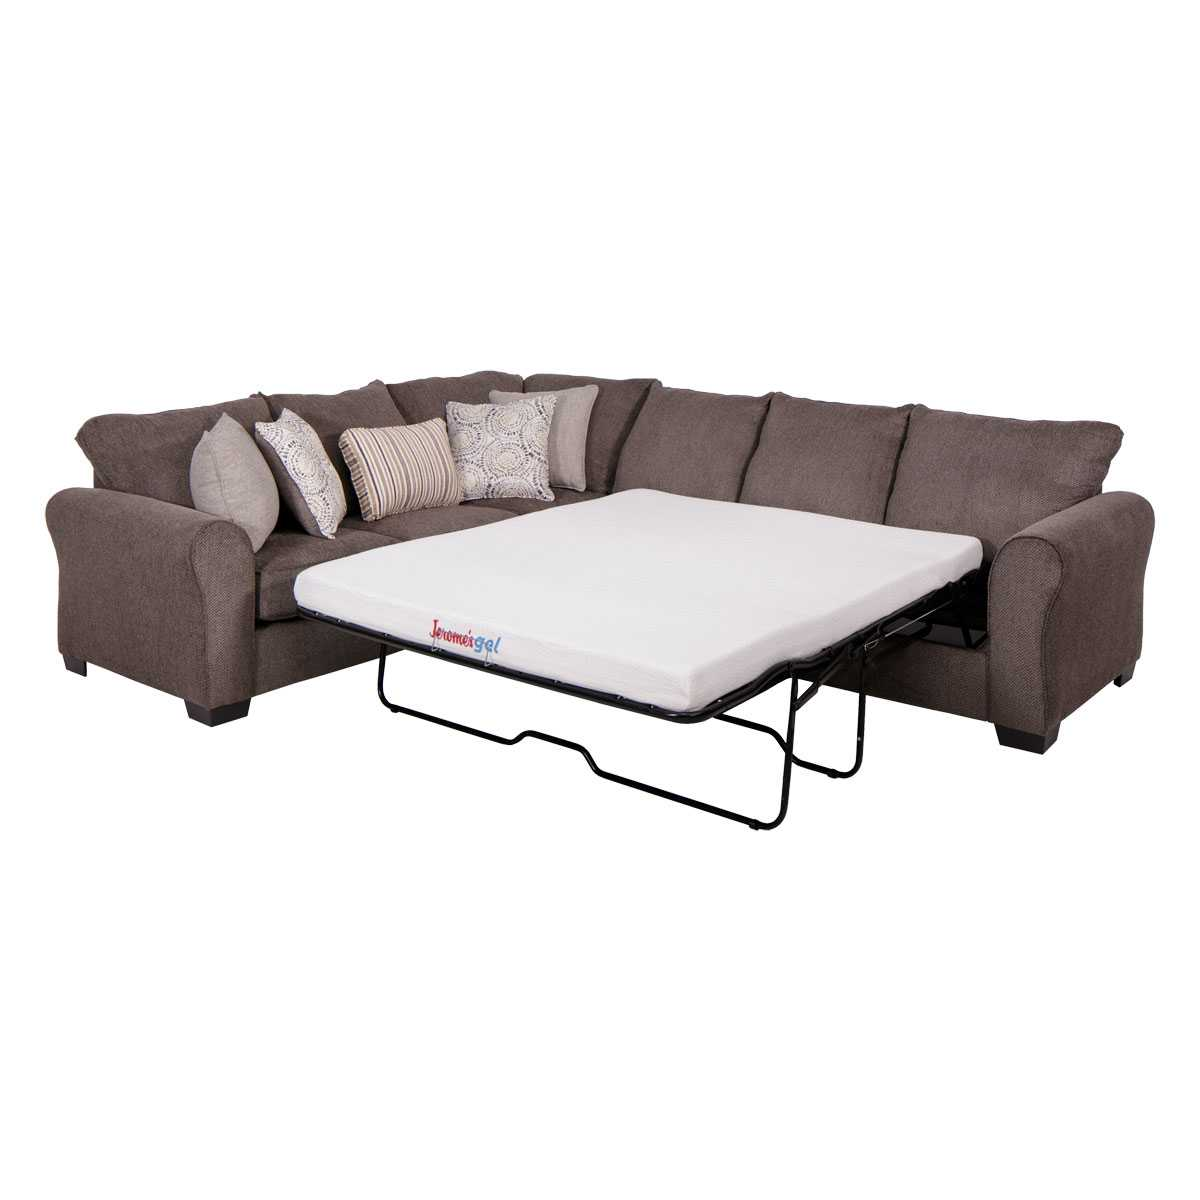 Queen Convertible Sofa Raf Medium Sofa Bed Jerome S Furniture